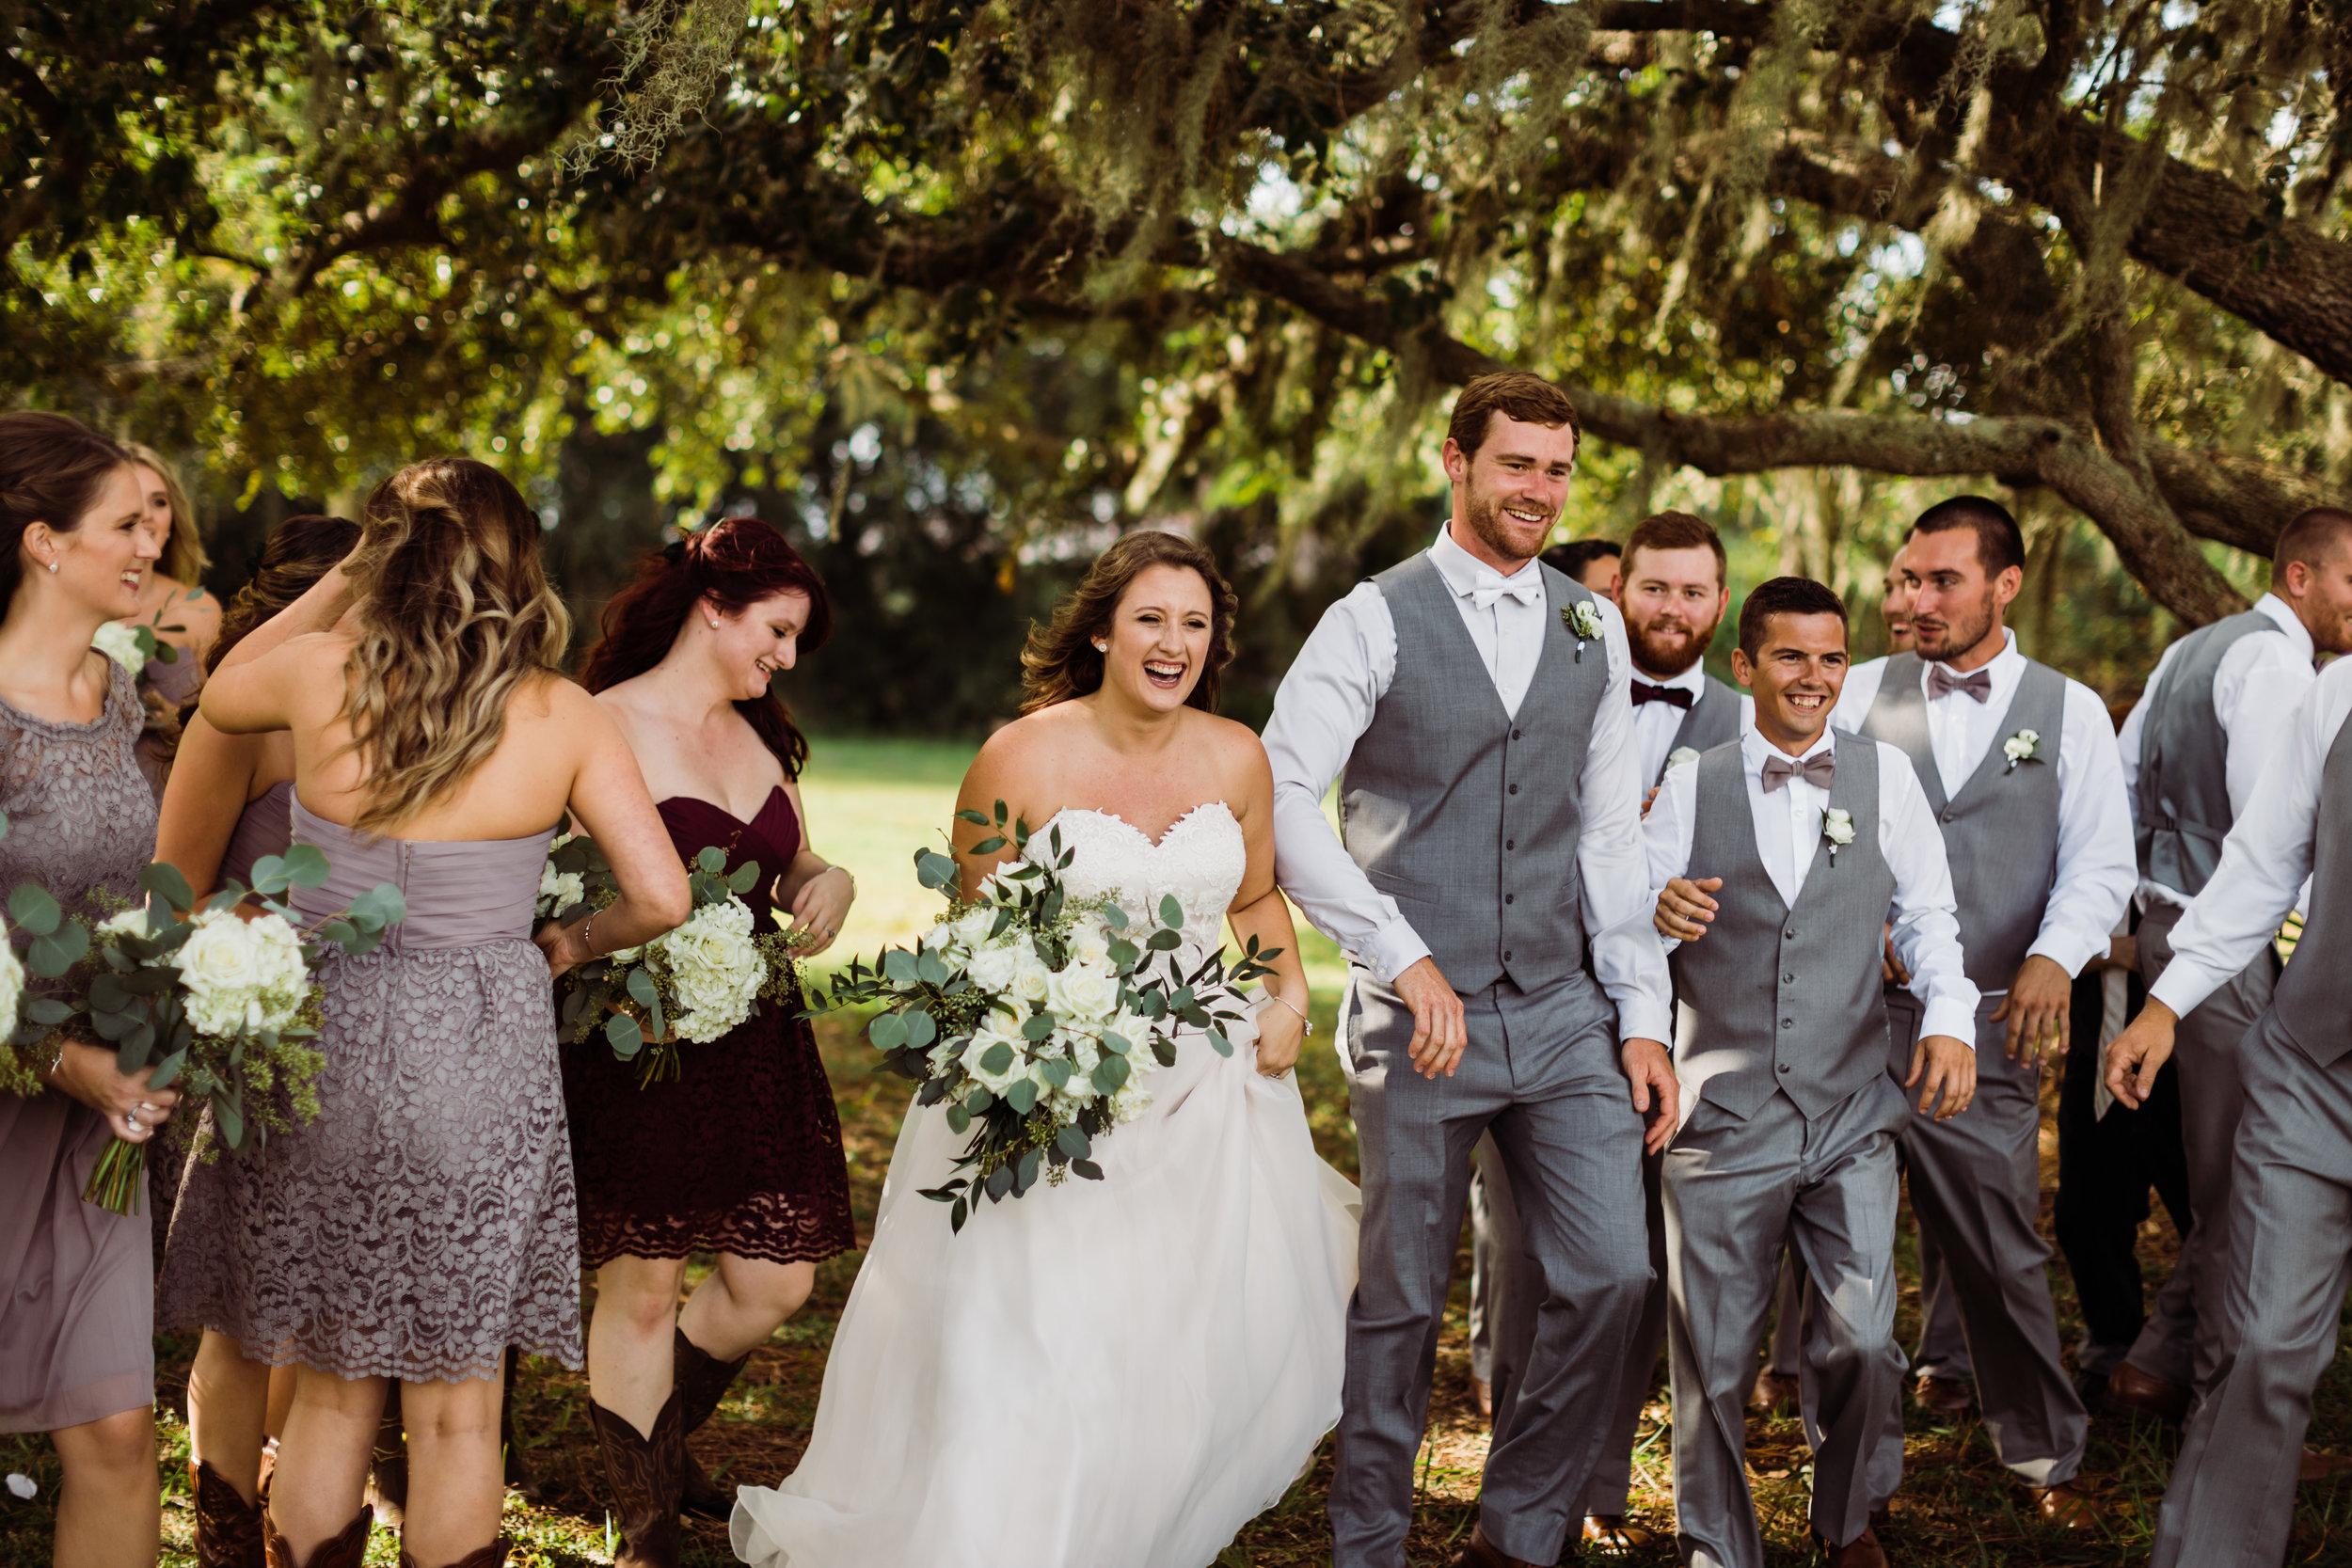 2017.10.14 Samantha and Matthew Crabtree Sarasota Wedding (261 of 708).jpg